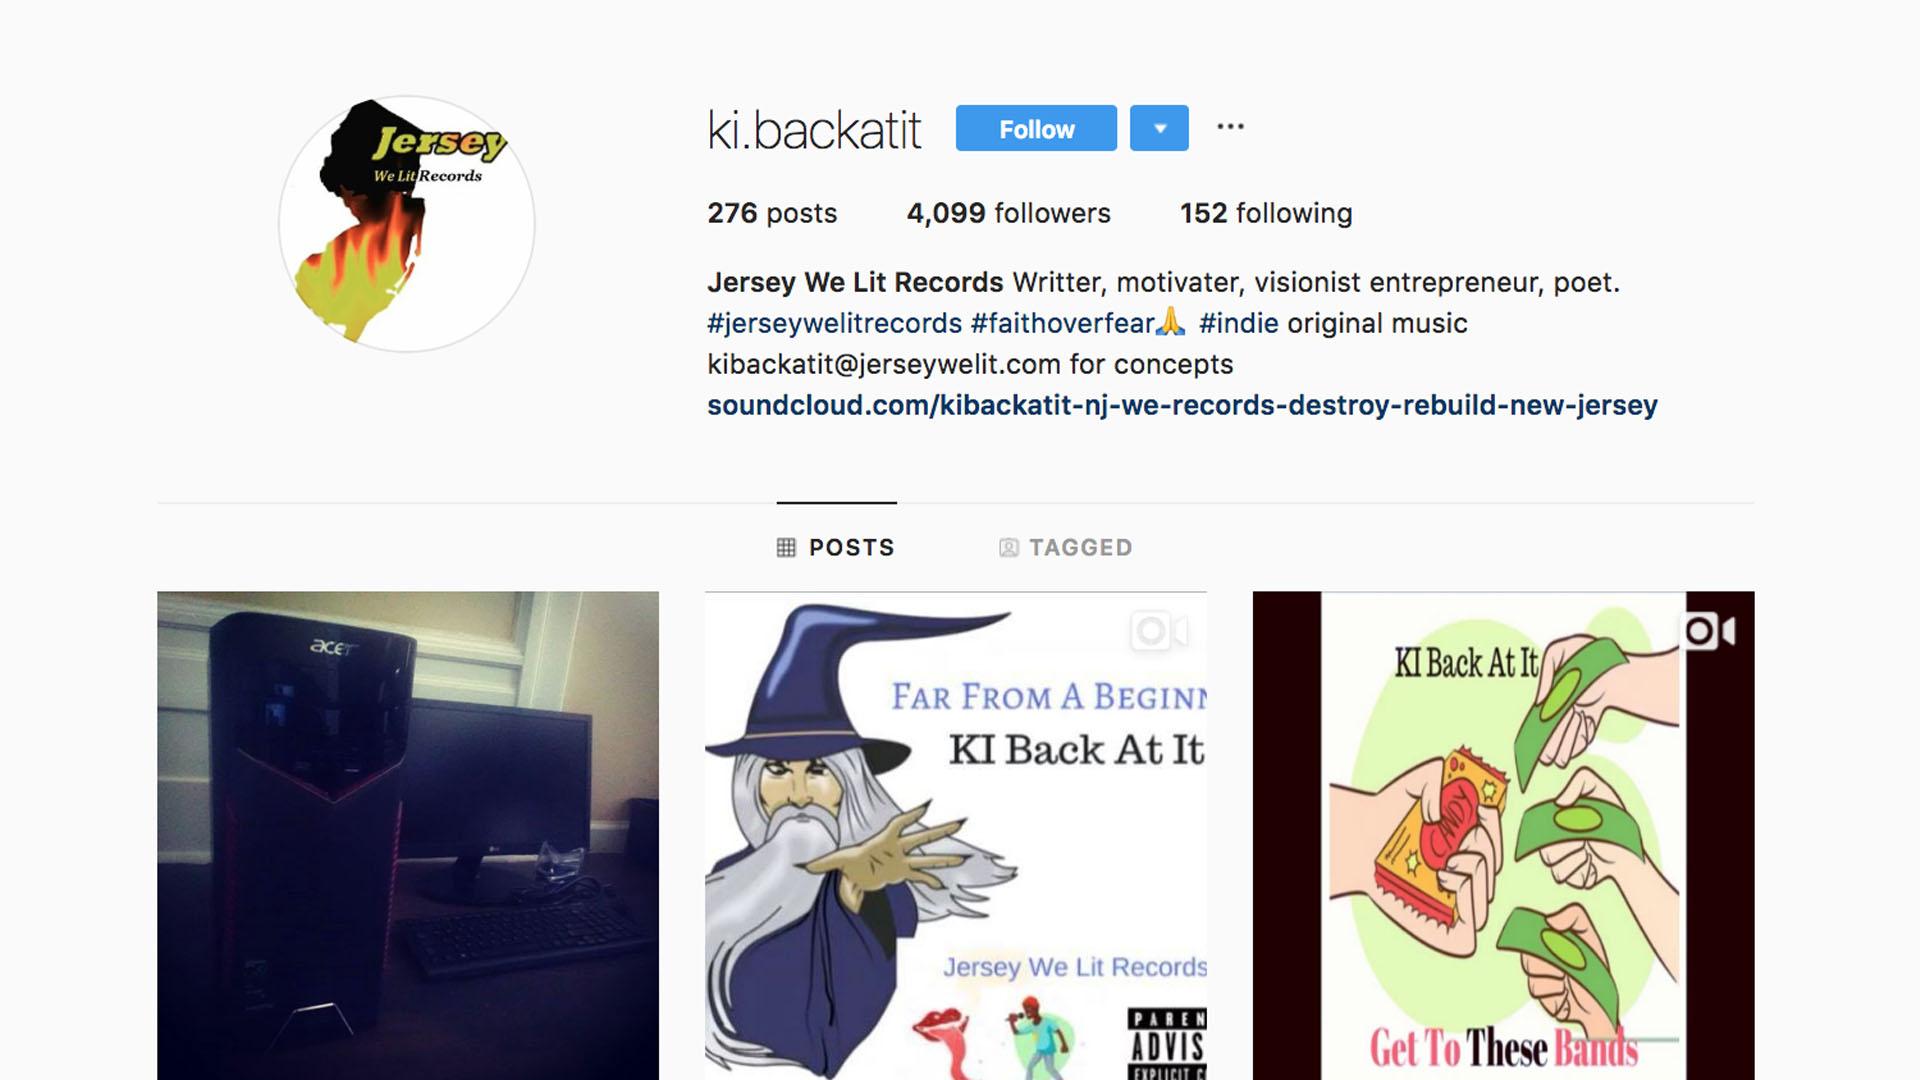 https://www.instagram.com/ki.backatit